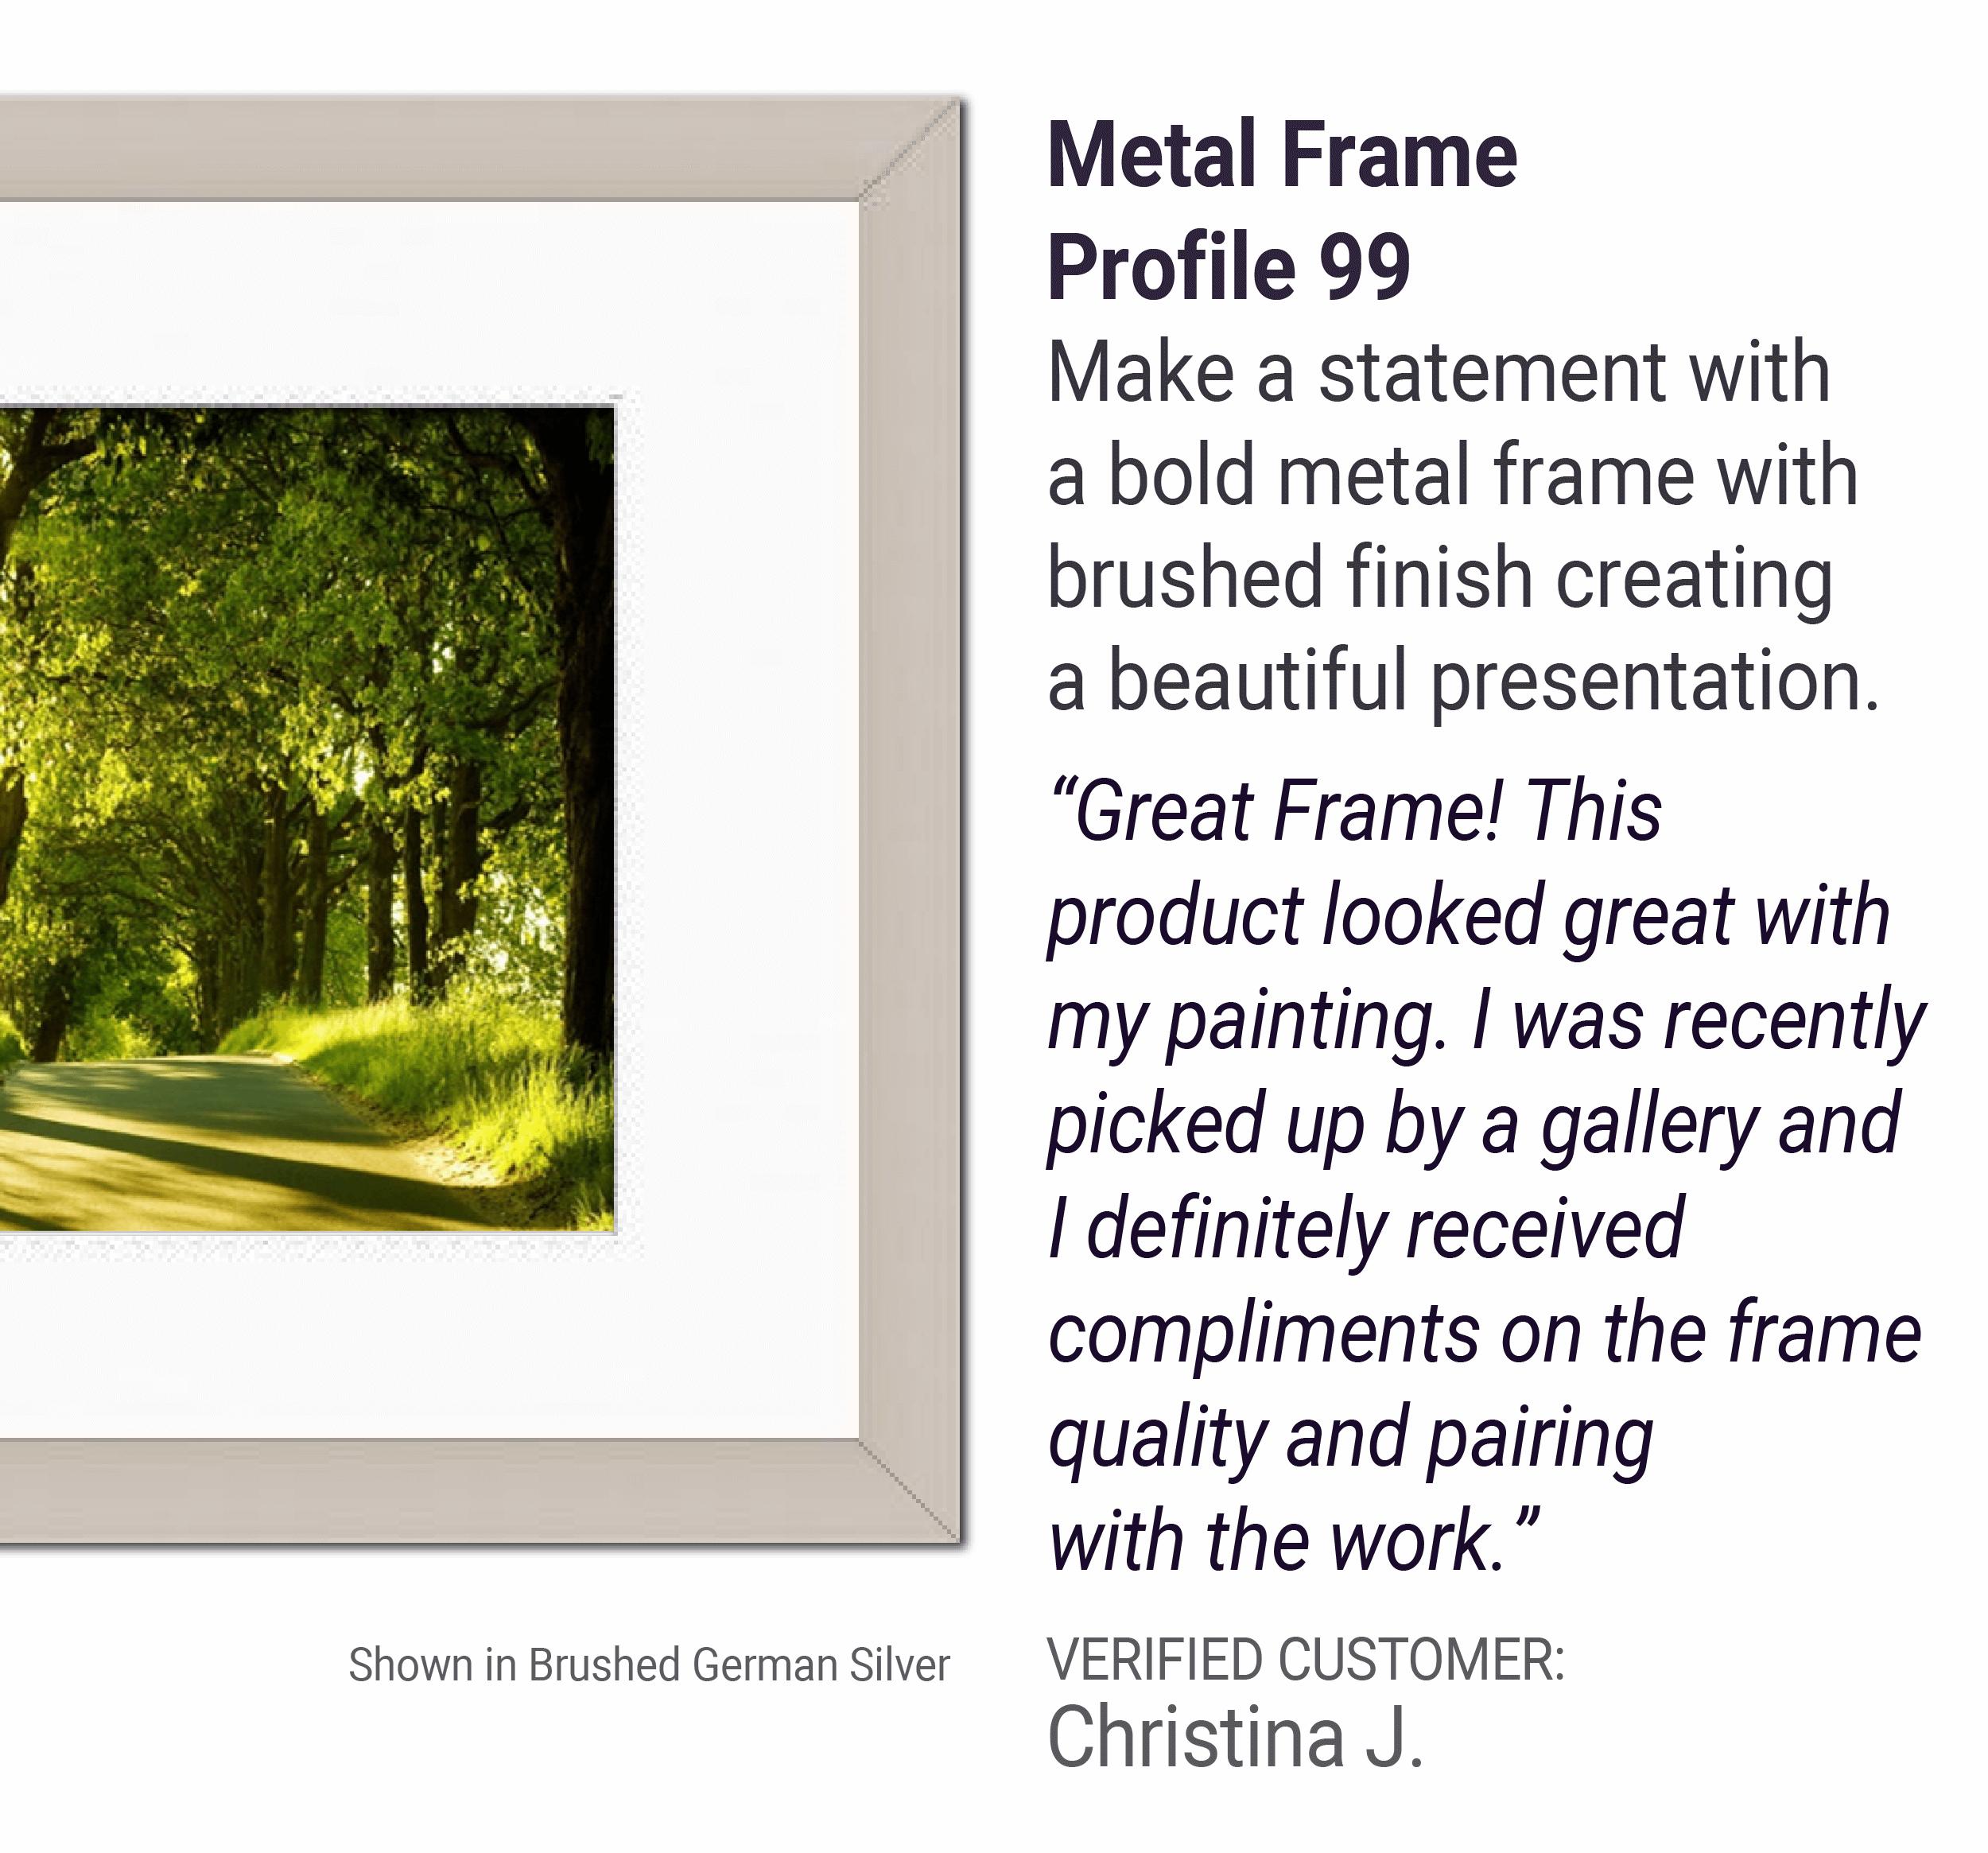 Metal Frame Profile 99